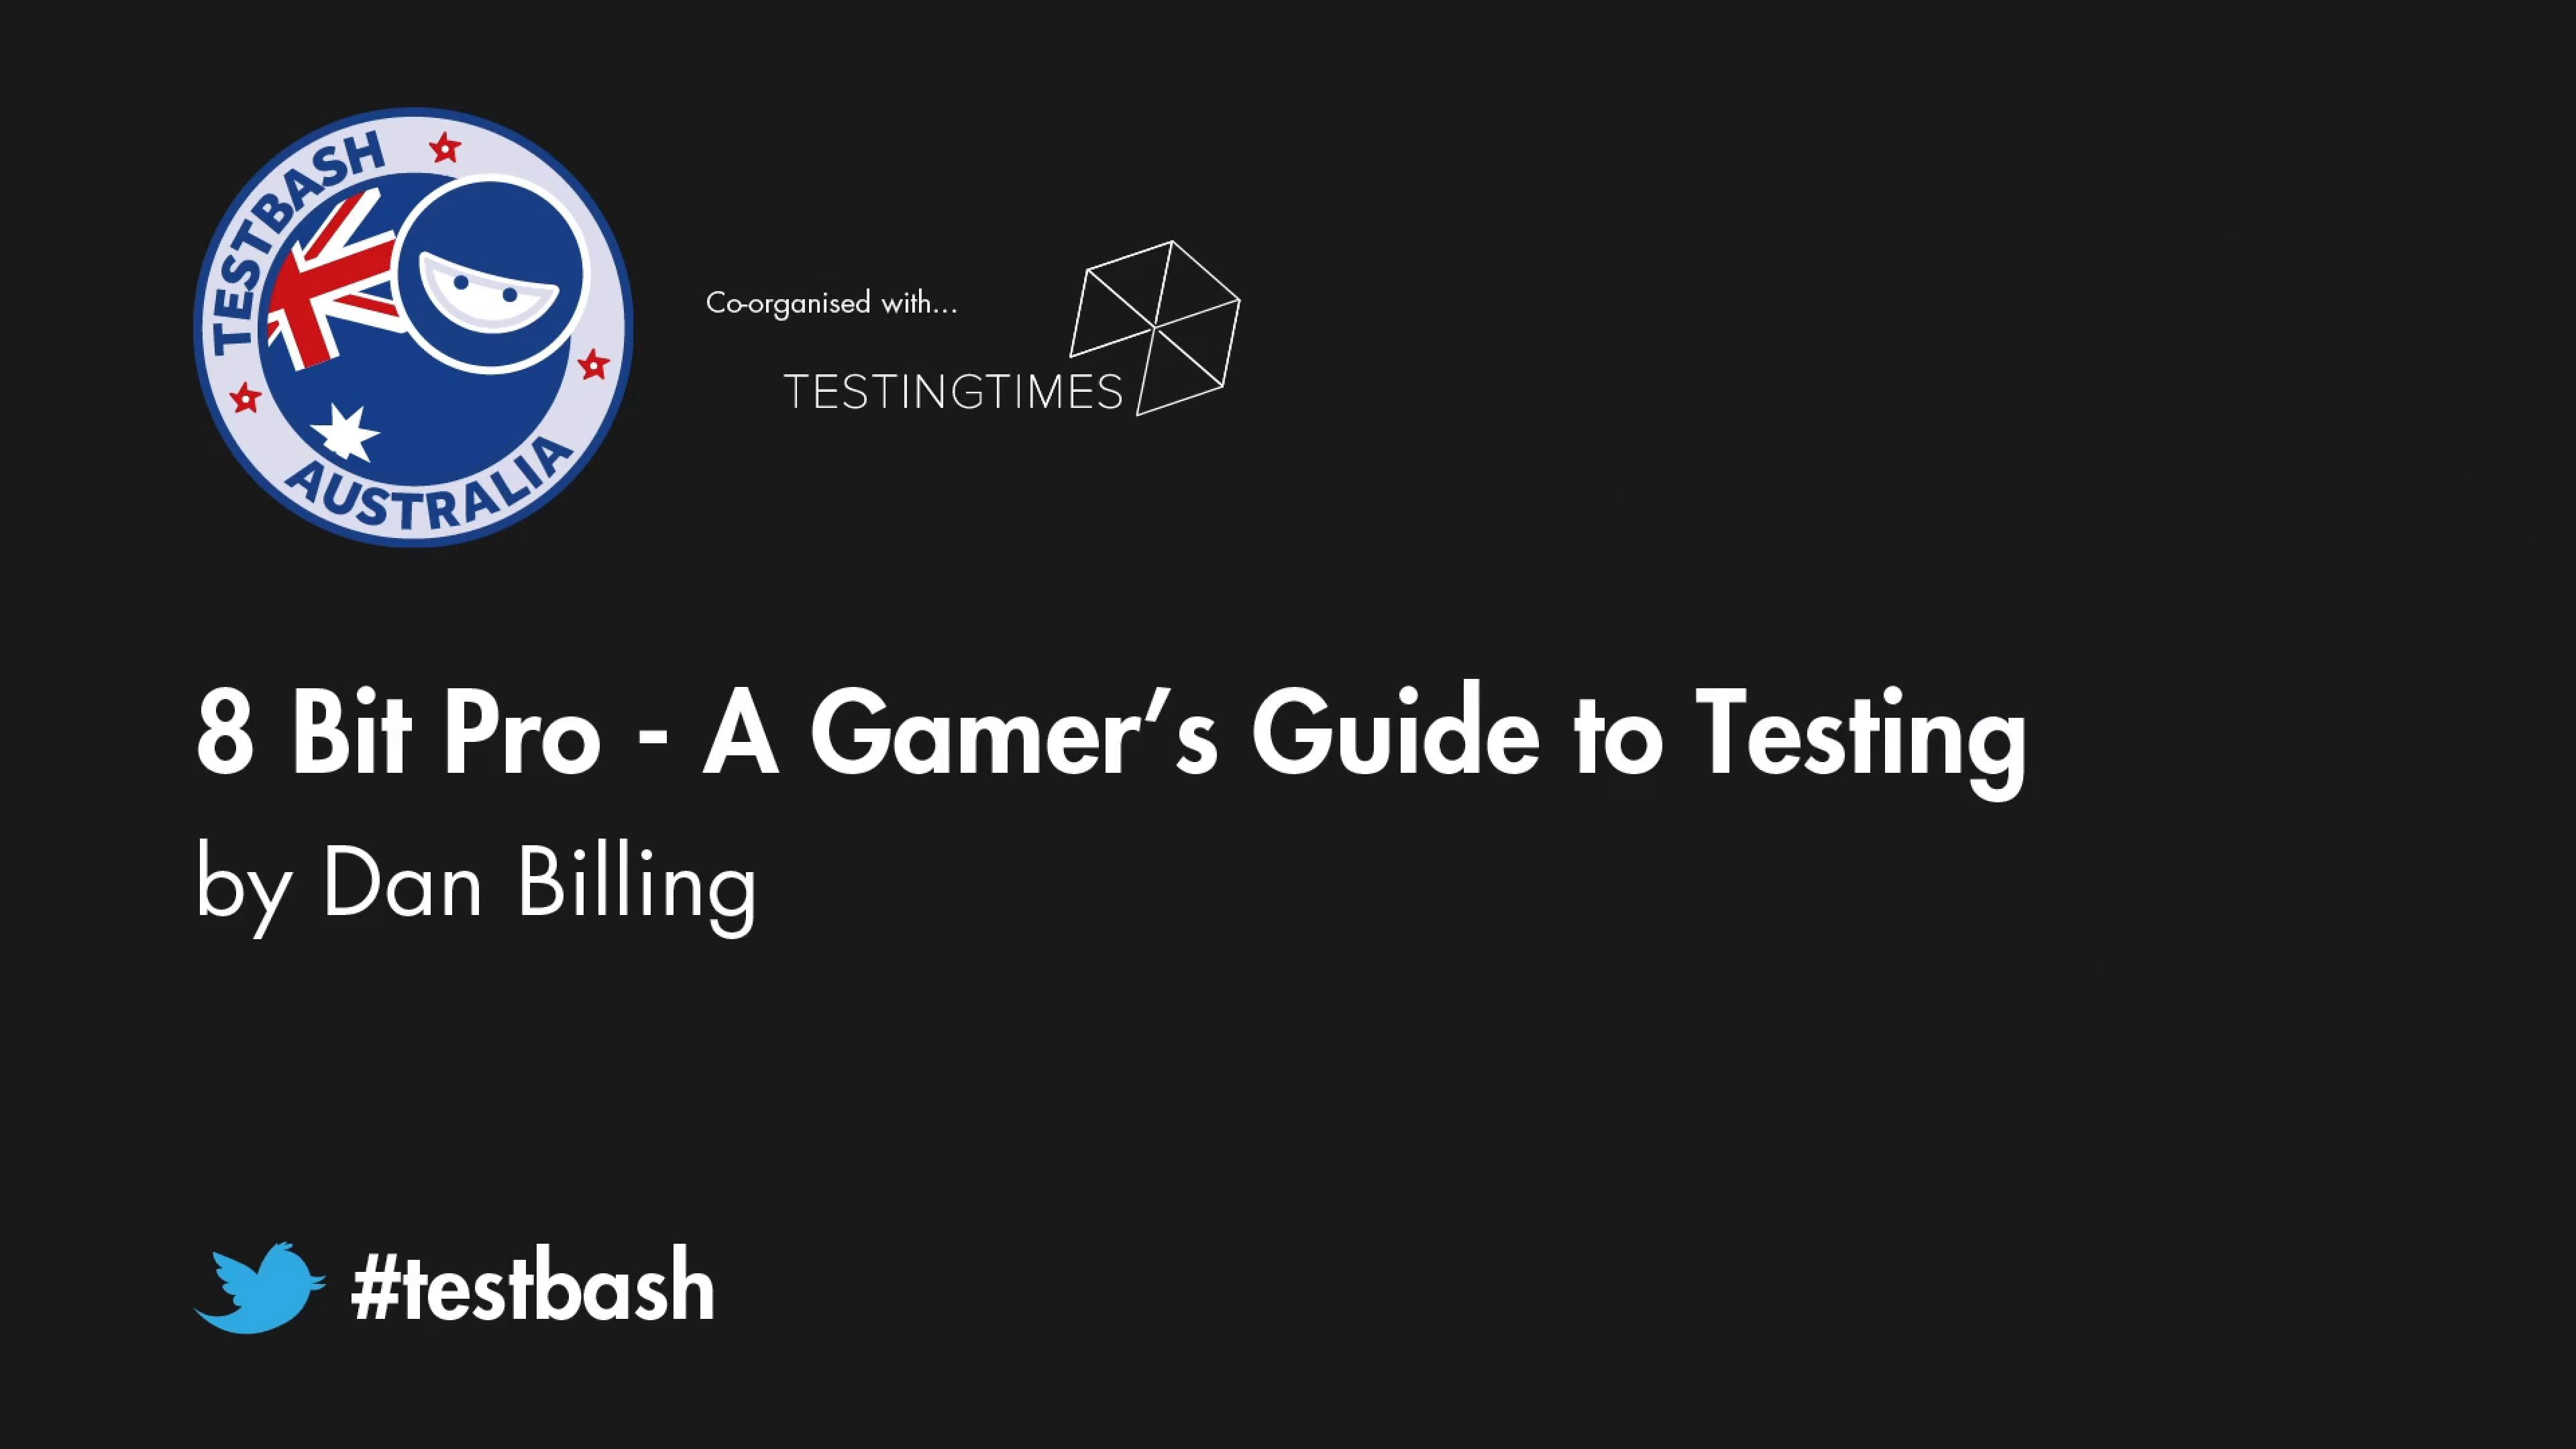 8 Bit Pro - A Gamer's Guide to Testing - Dan Billing